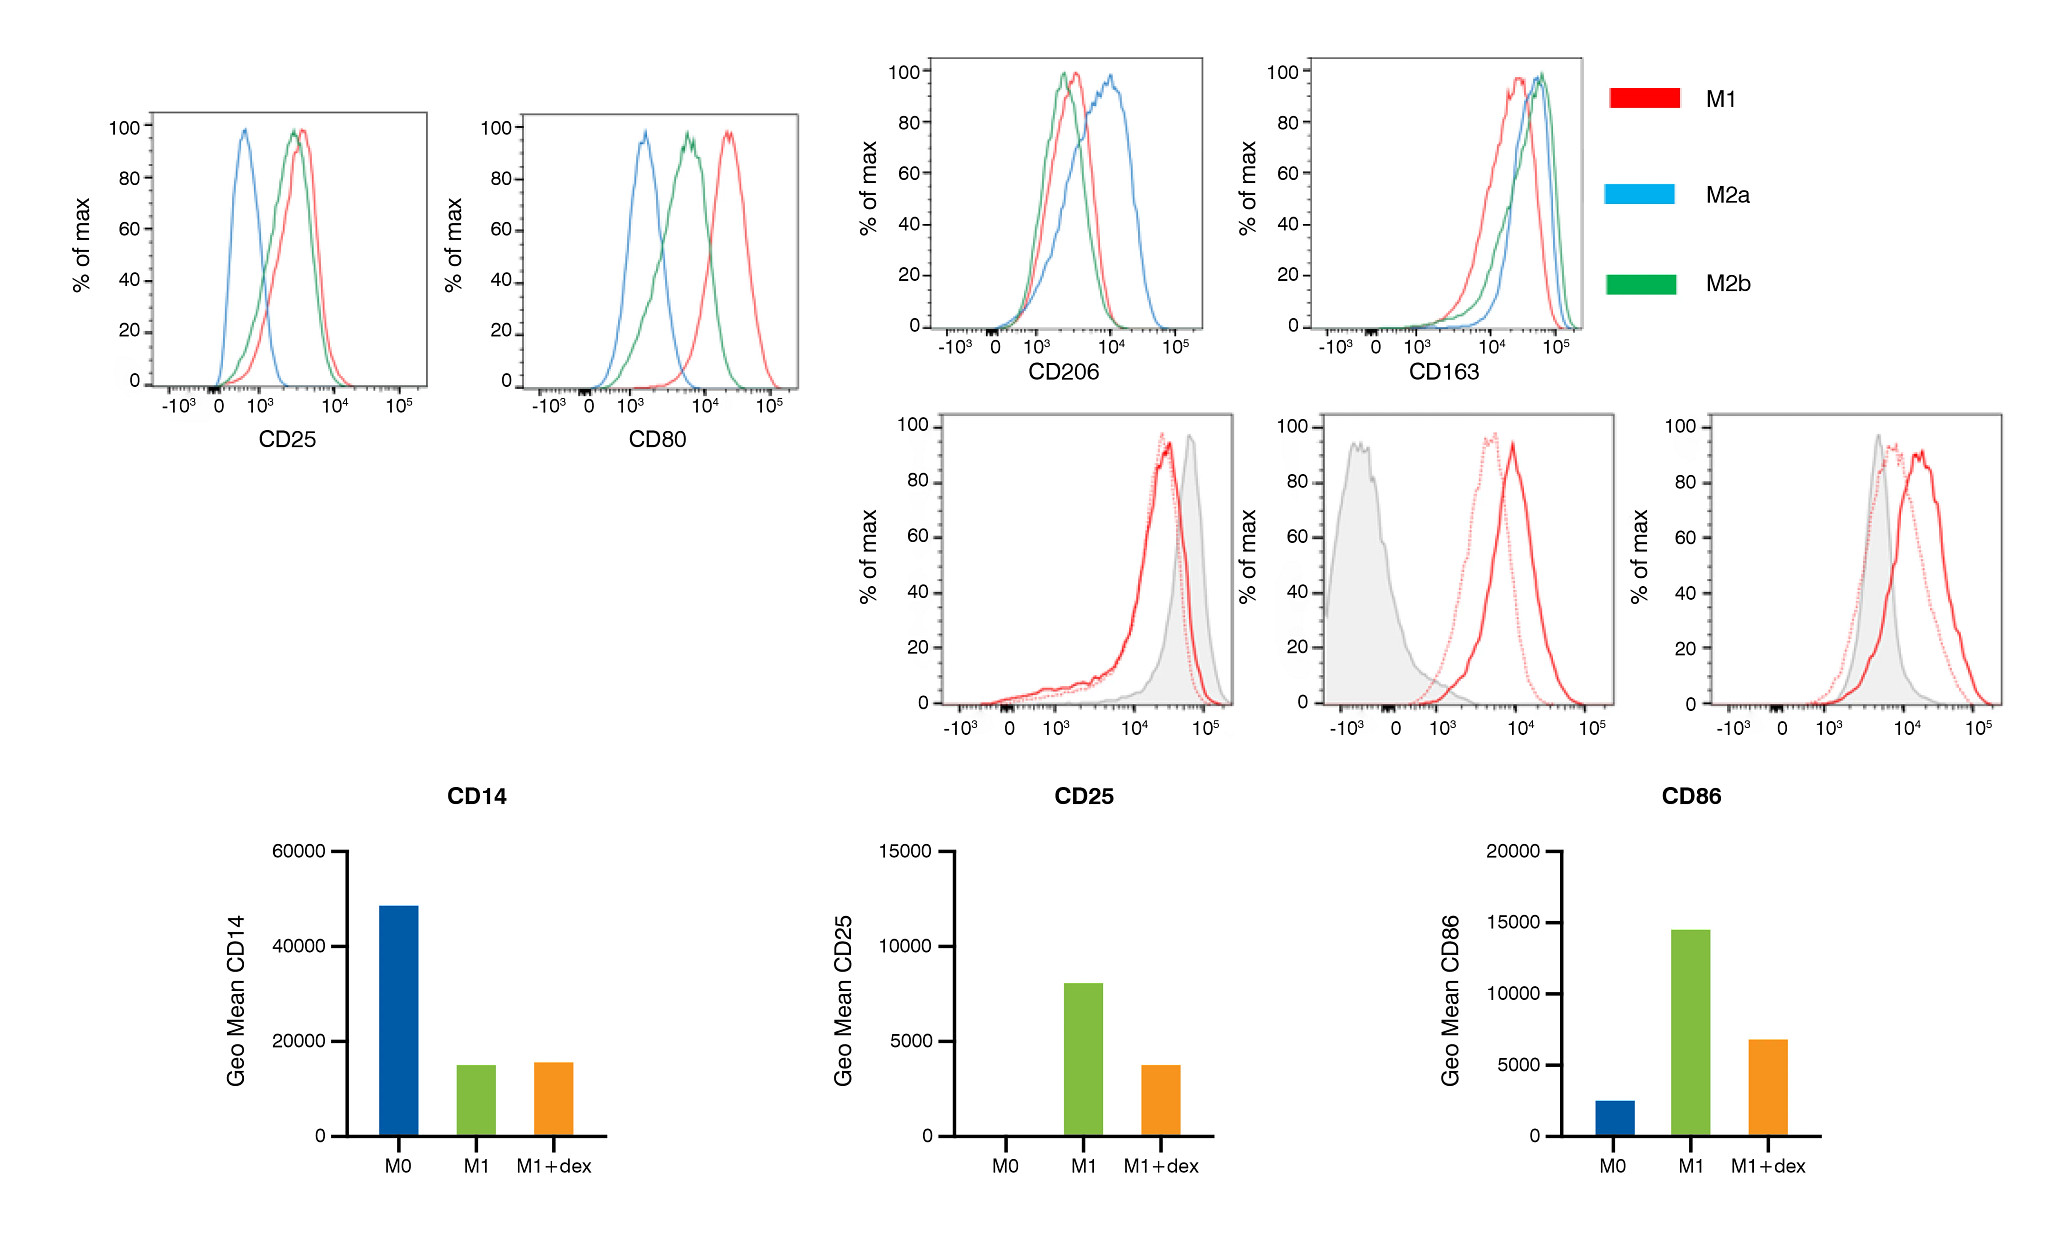 Schema of polarized macrophages following treatment with dexamethasone